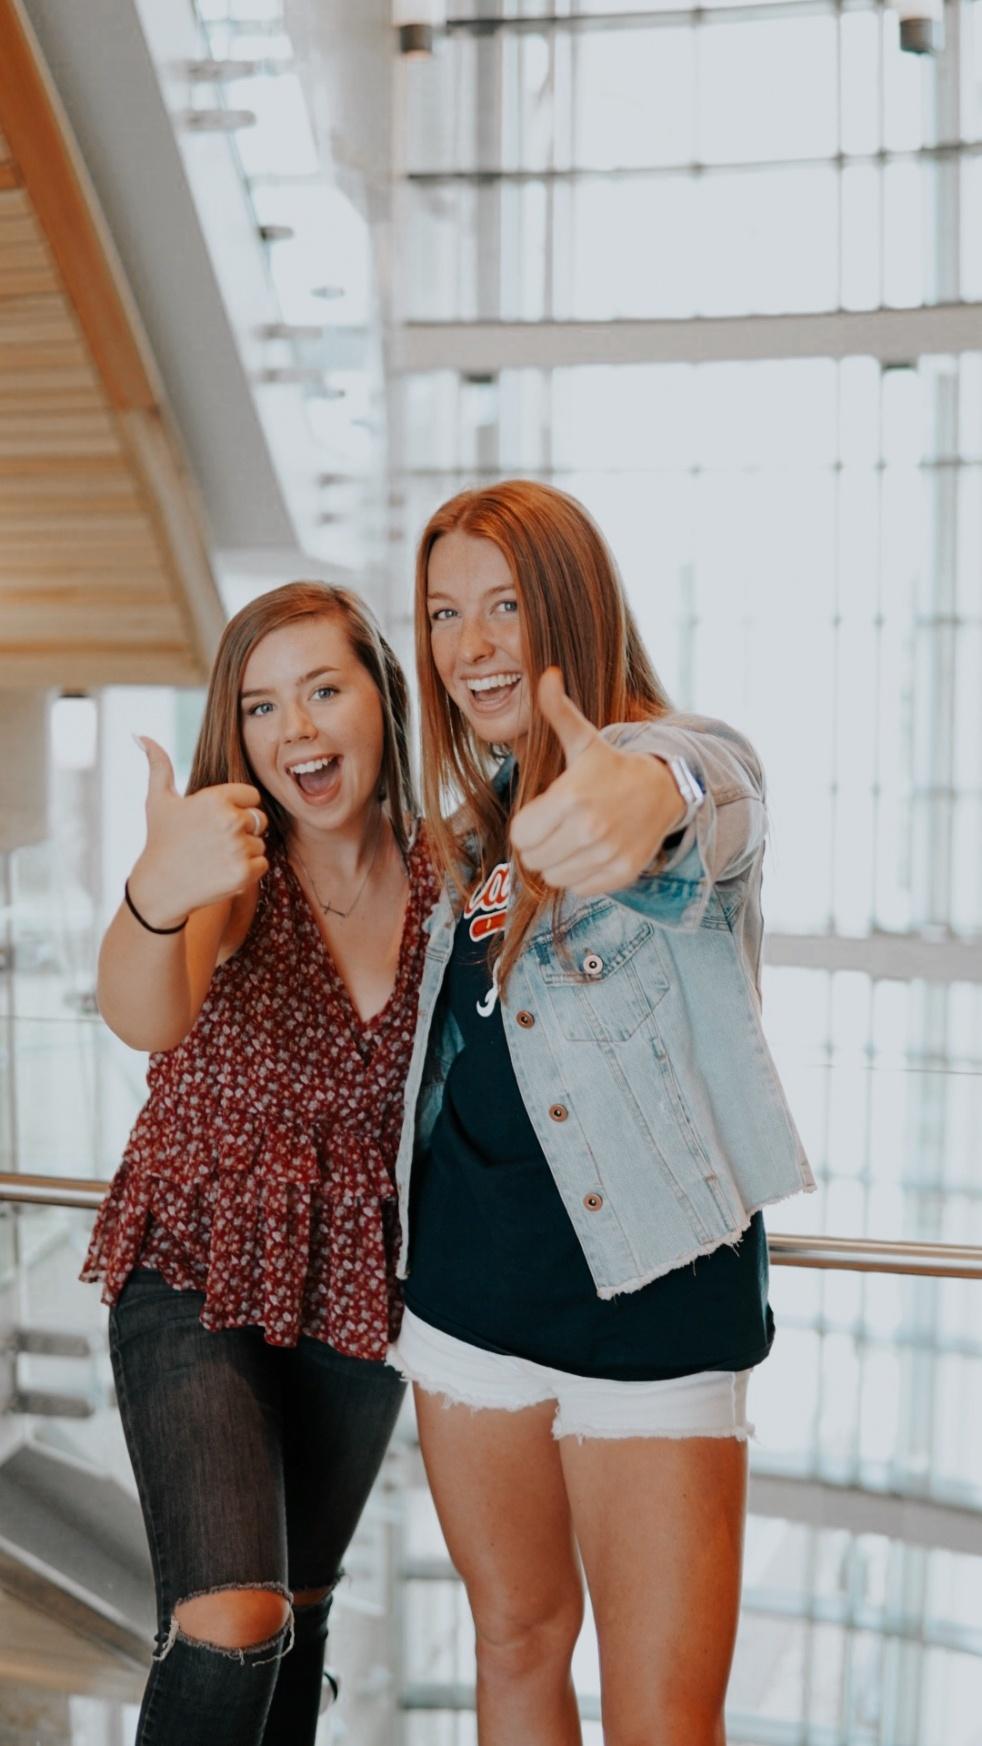 Hot Mic Podcast with Kelli & Corinne - imagen de portada